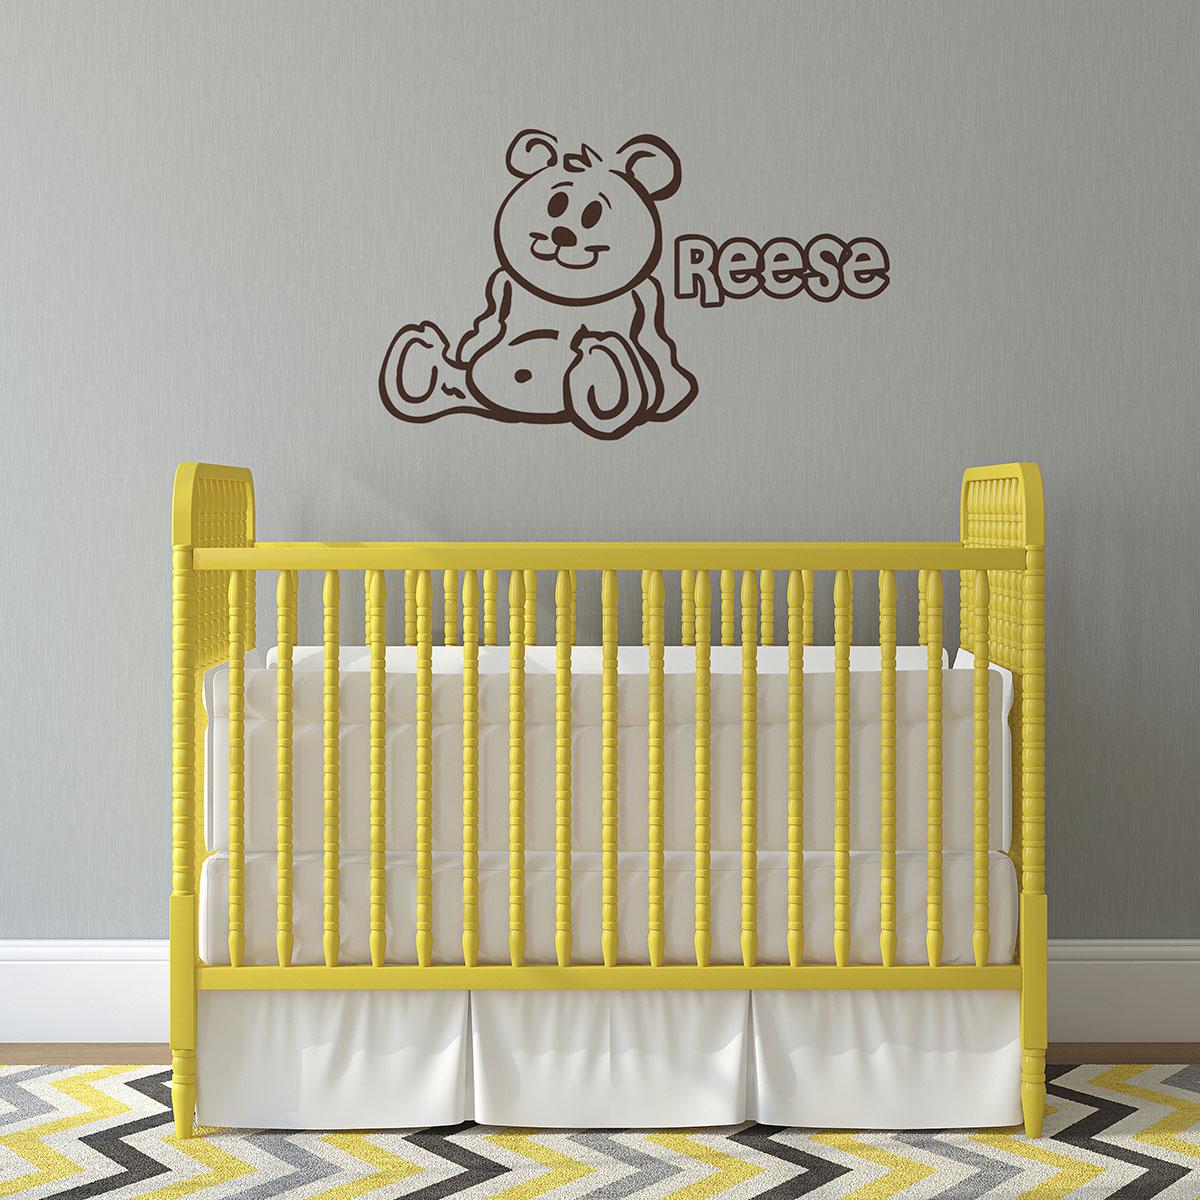 personalised wall sticker teddy gettingpersonal co uk